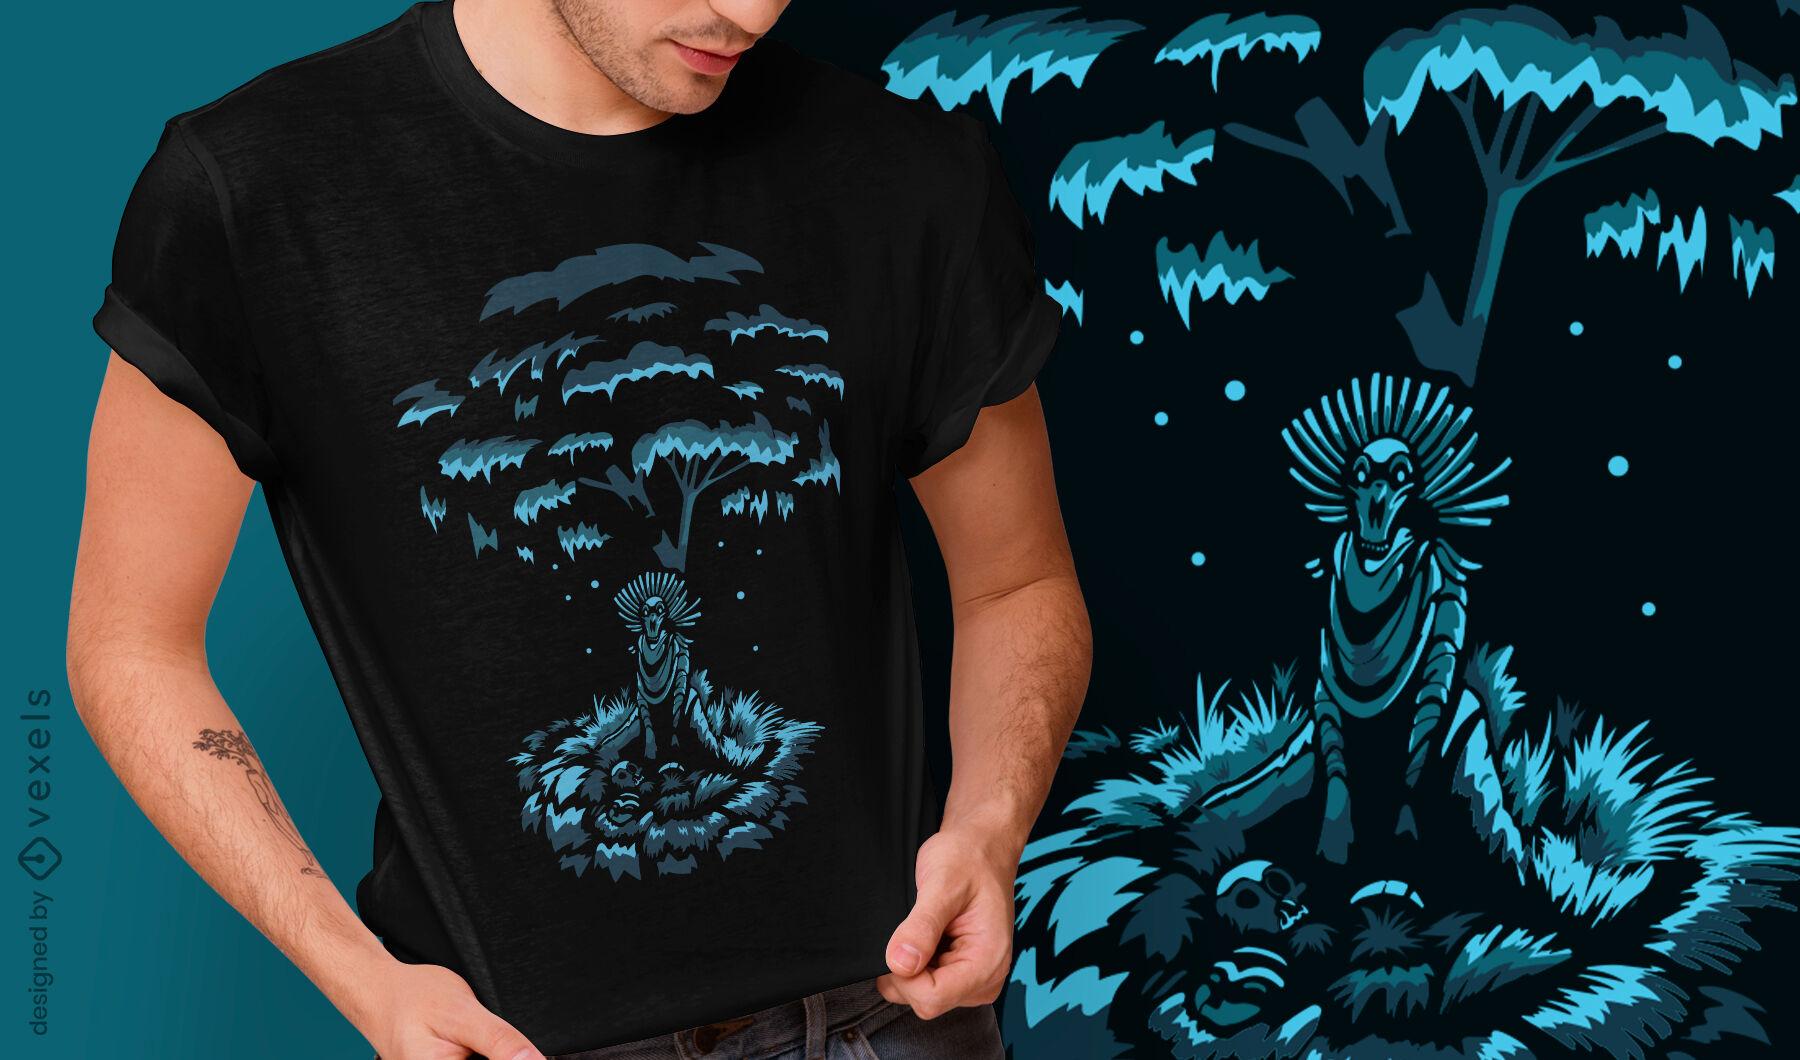 Dark creature creepy demon t-shirt design